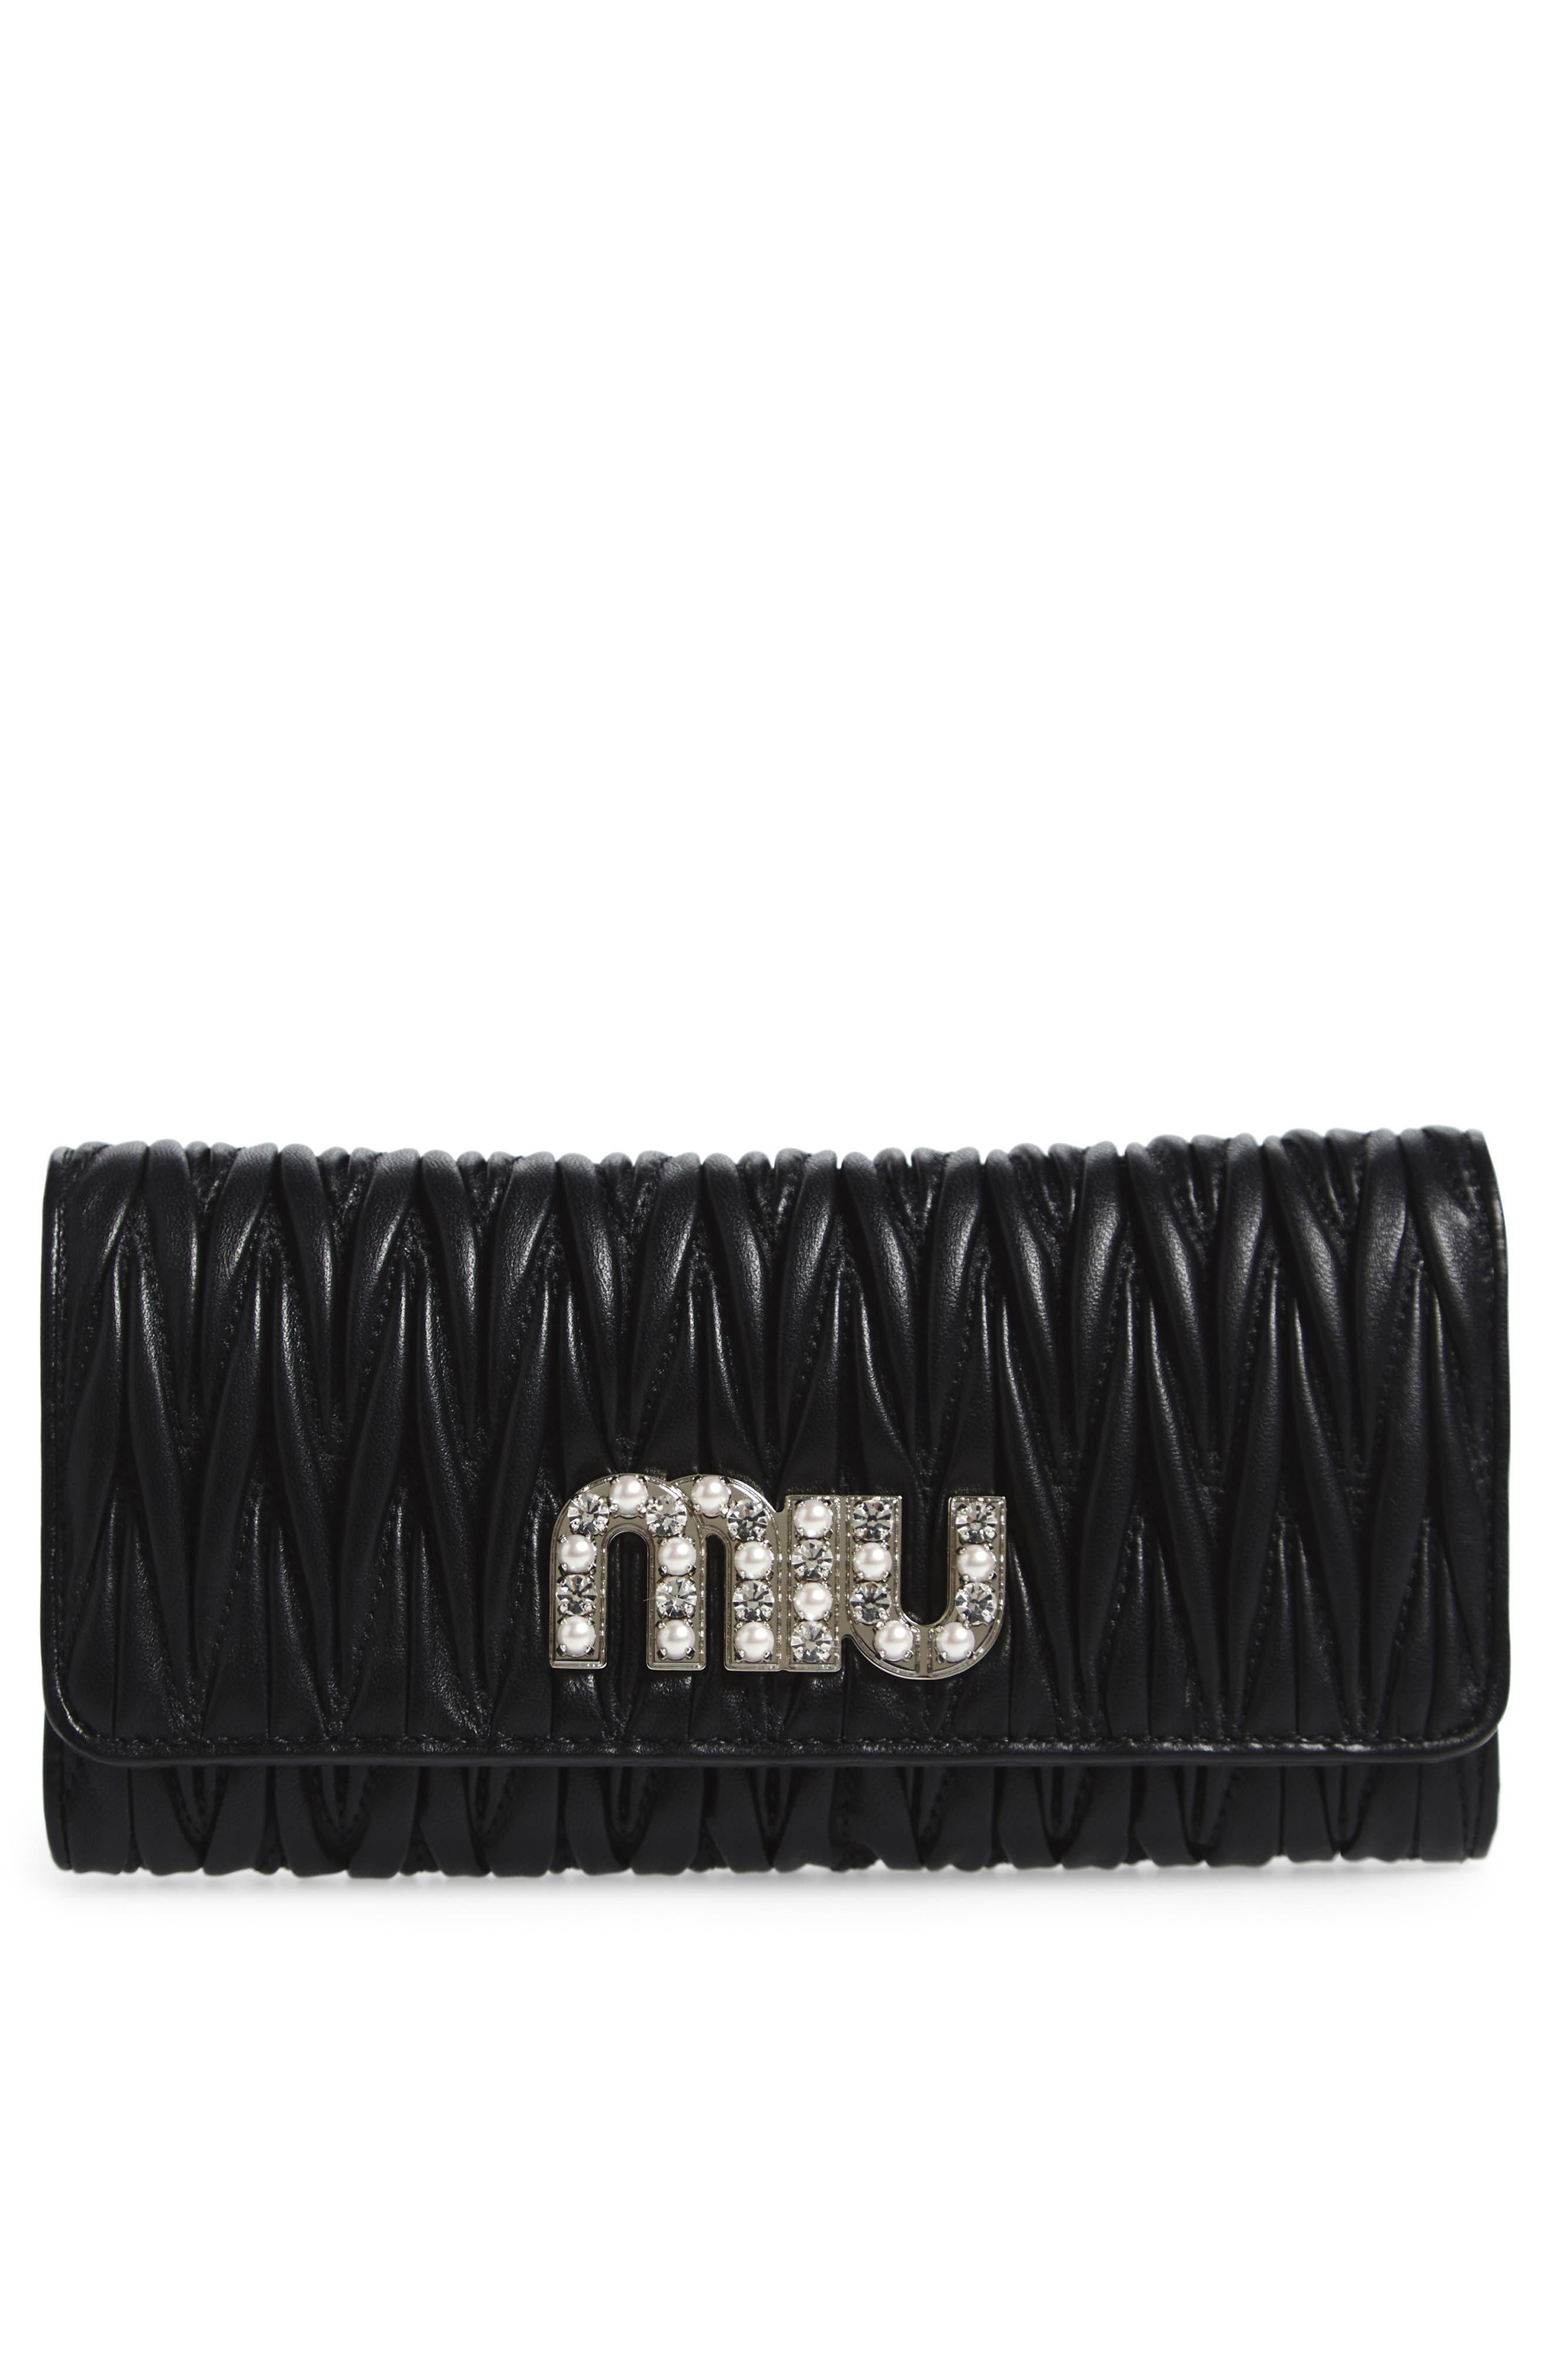 Main Image - Miu Miu Embellished Logo Matelassé Leather Continental Wallet